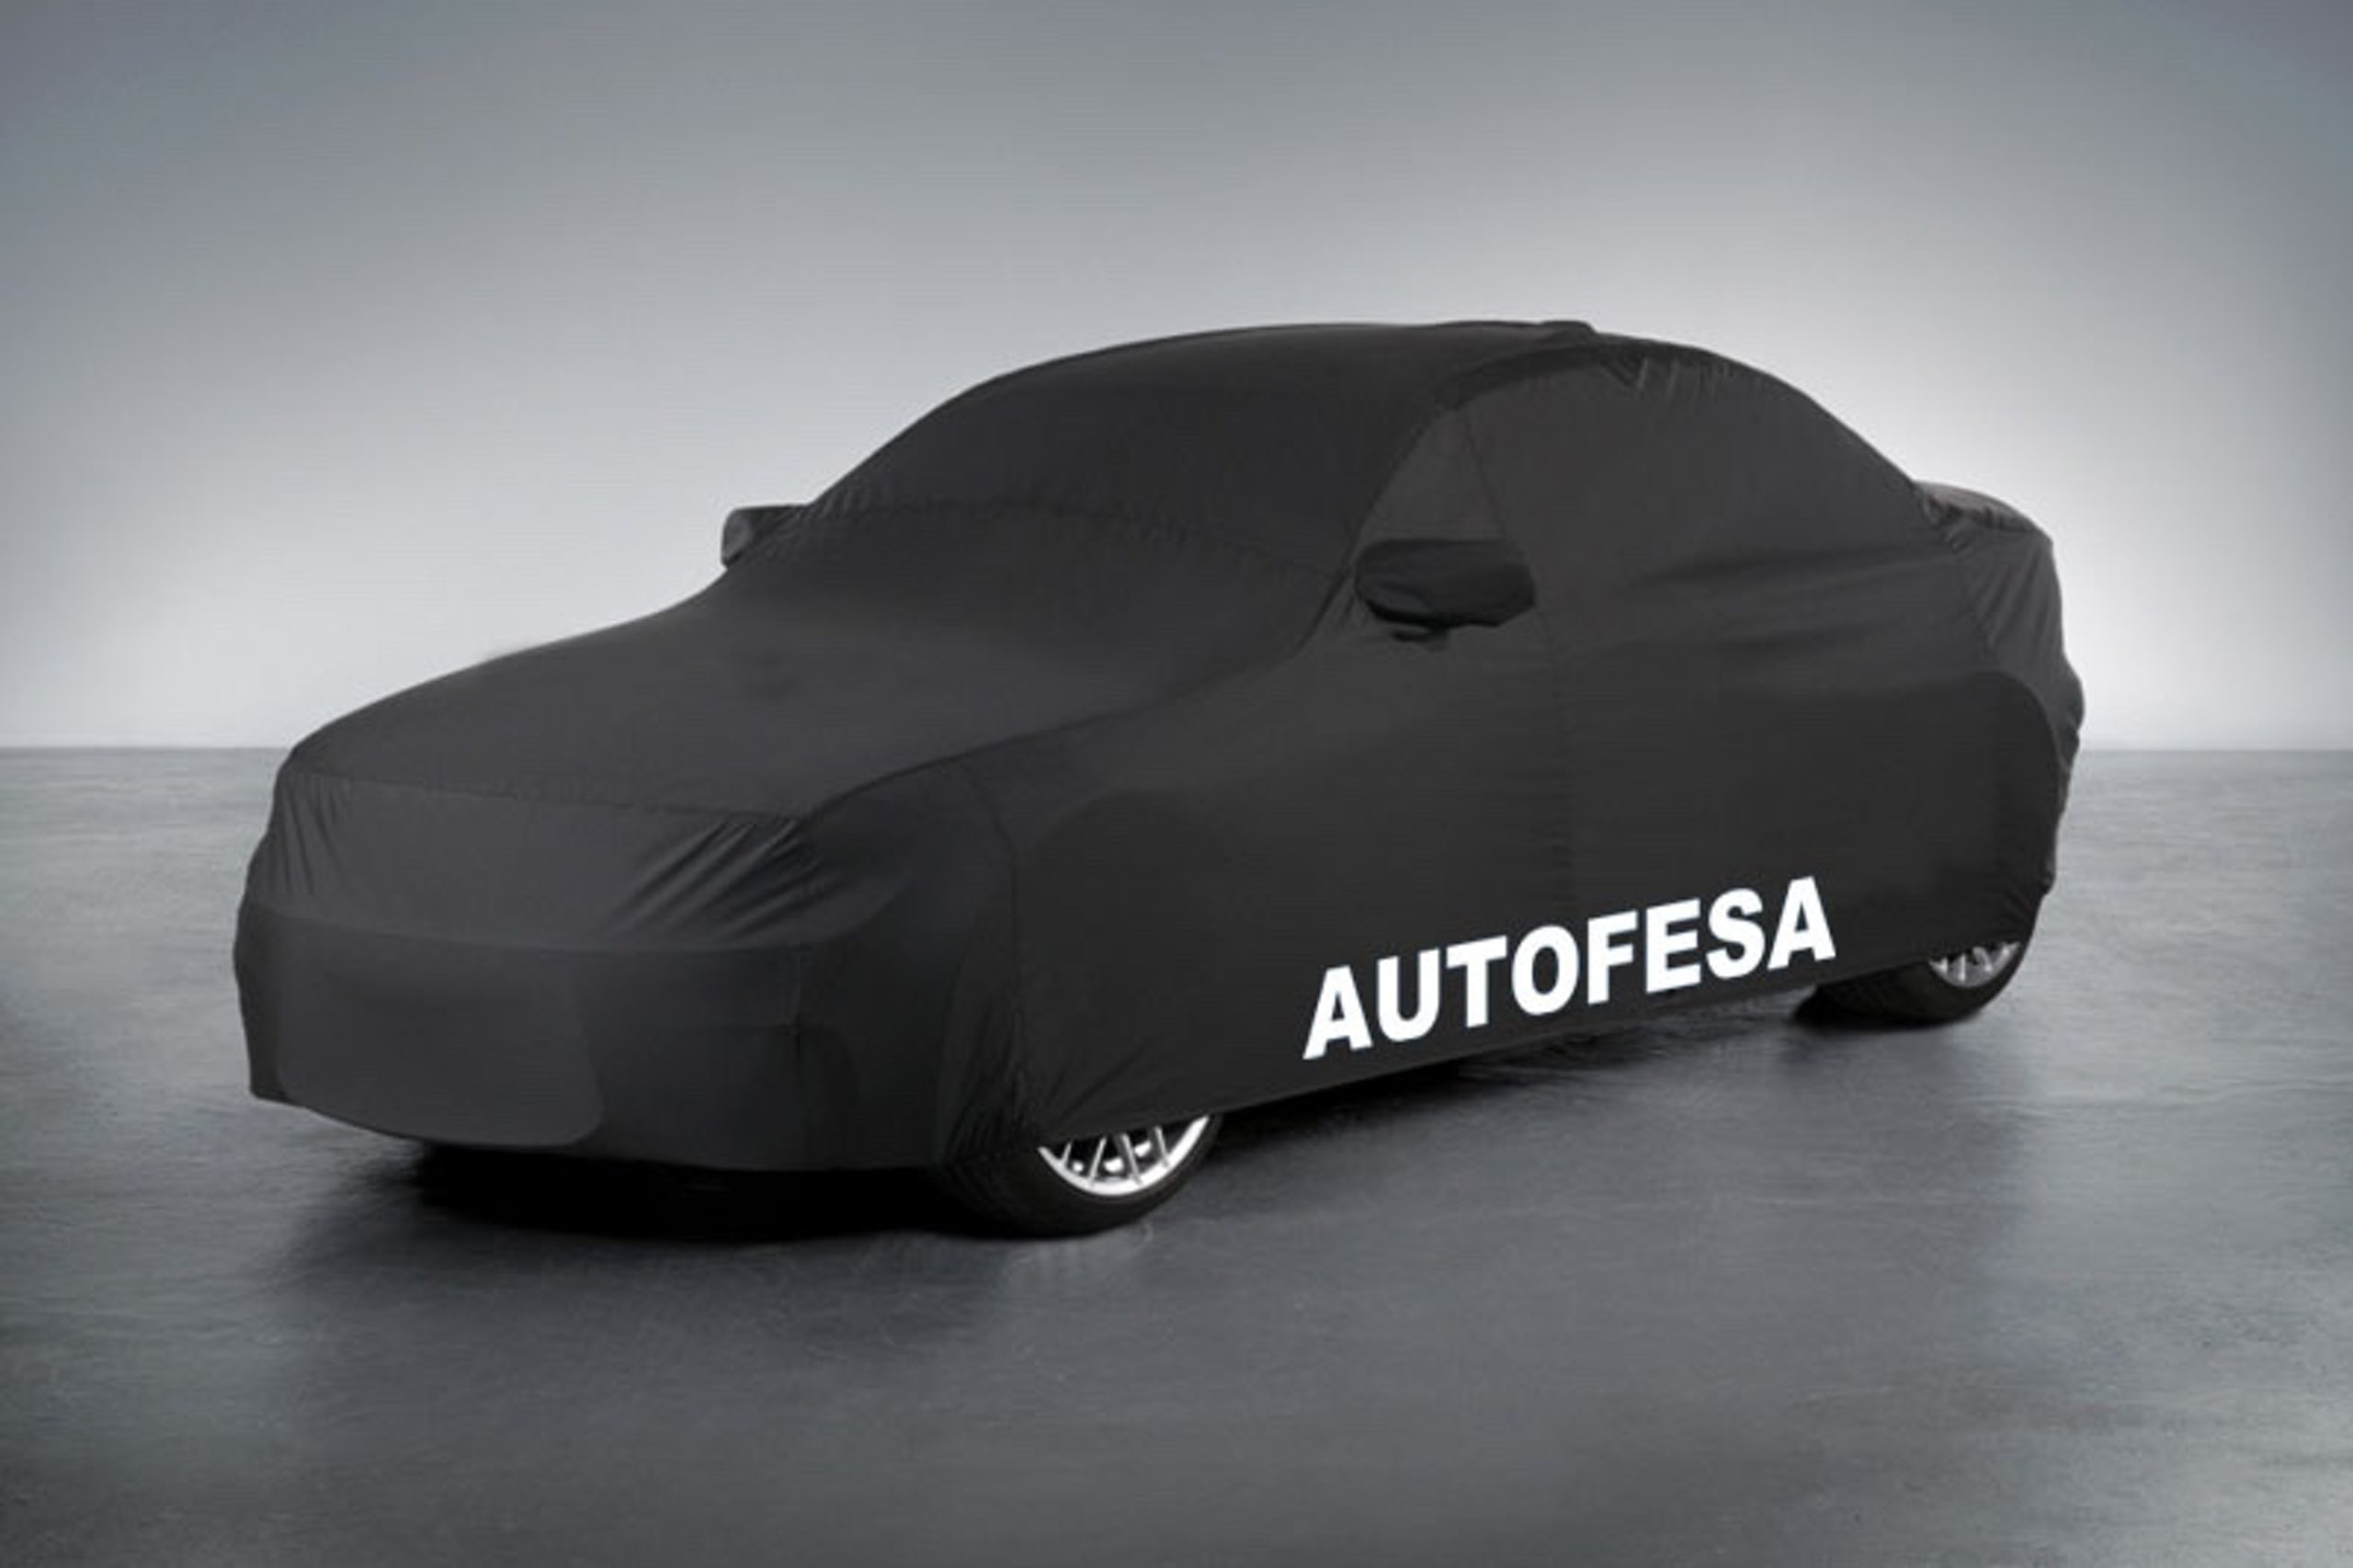 Audi A6 A6 3.0 TDI AVANT 204cv quattro 5p S tronic Auto S/S - Foto 6